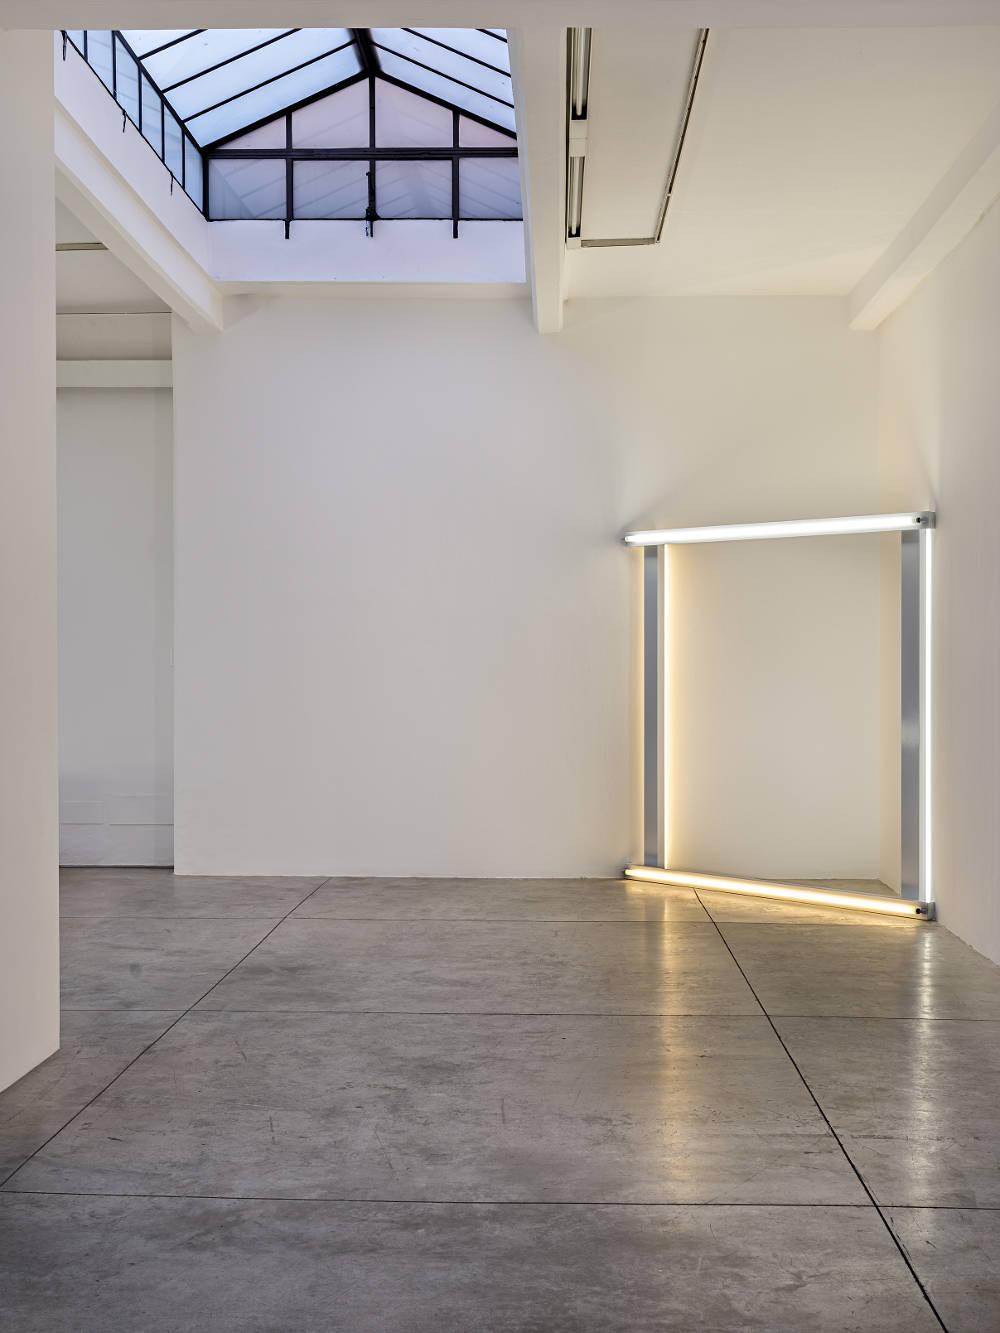 Cardi Gallery Milan Dan Flavin 3